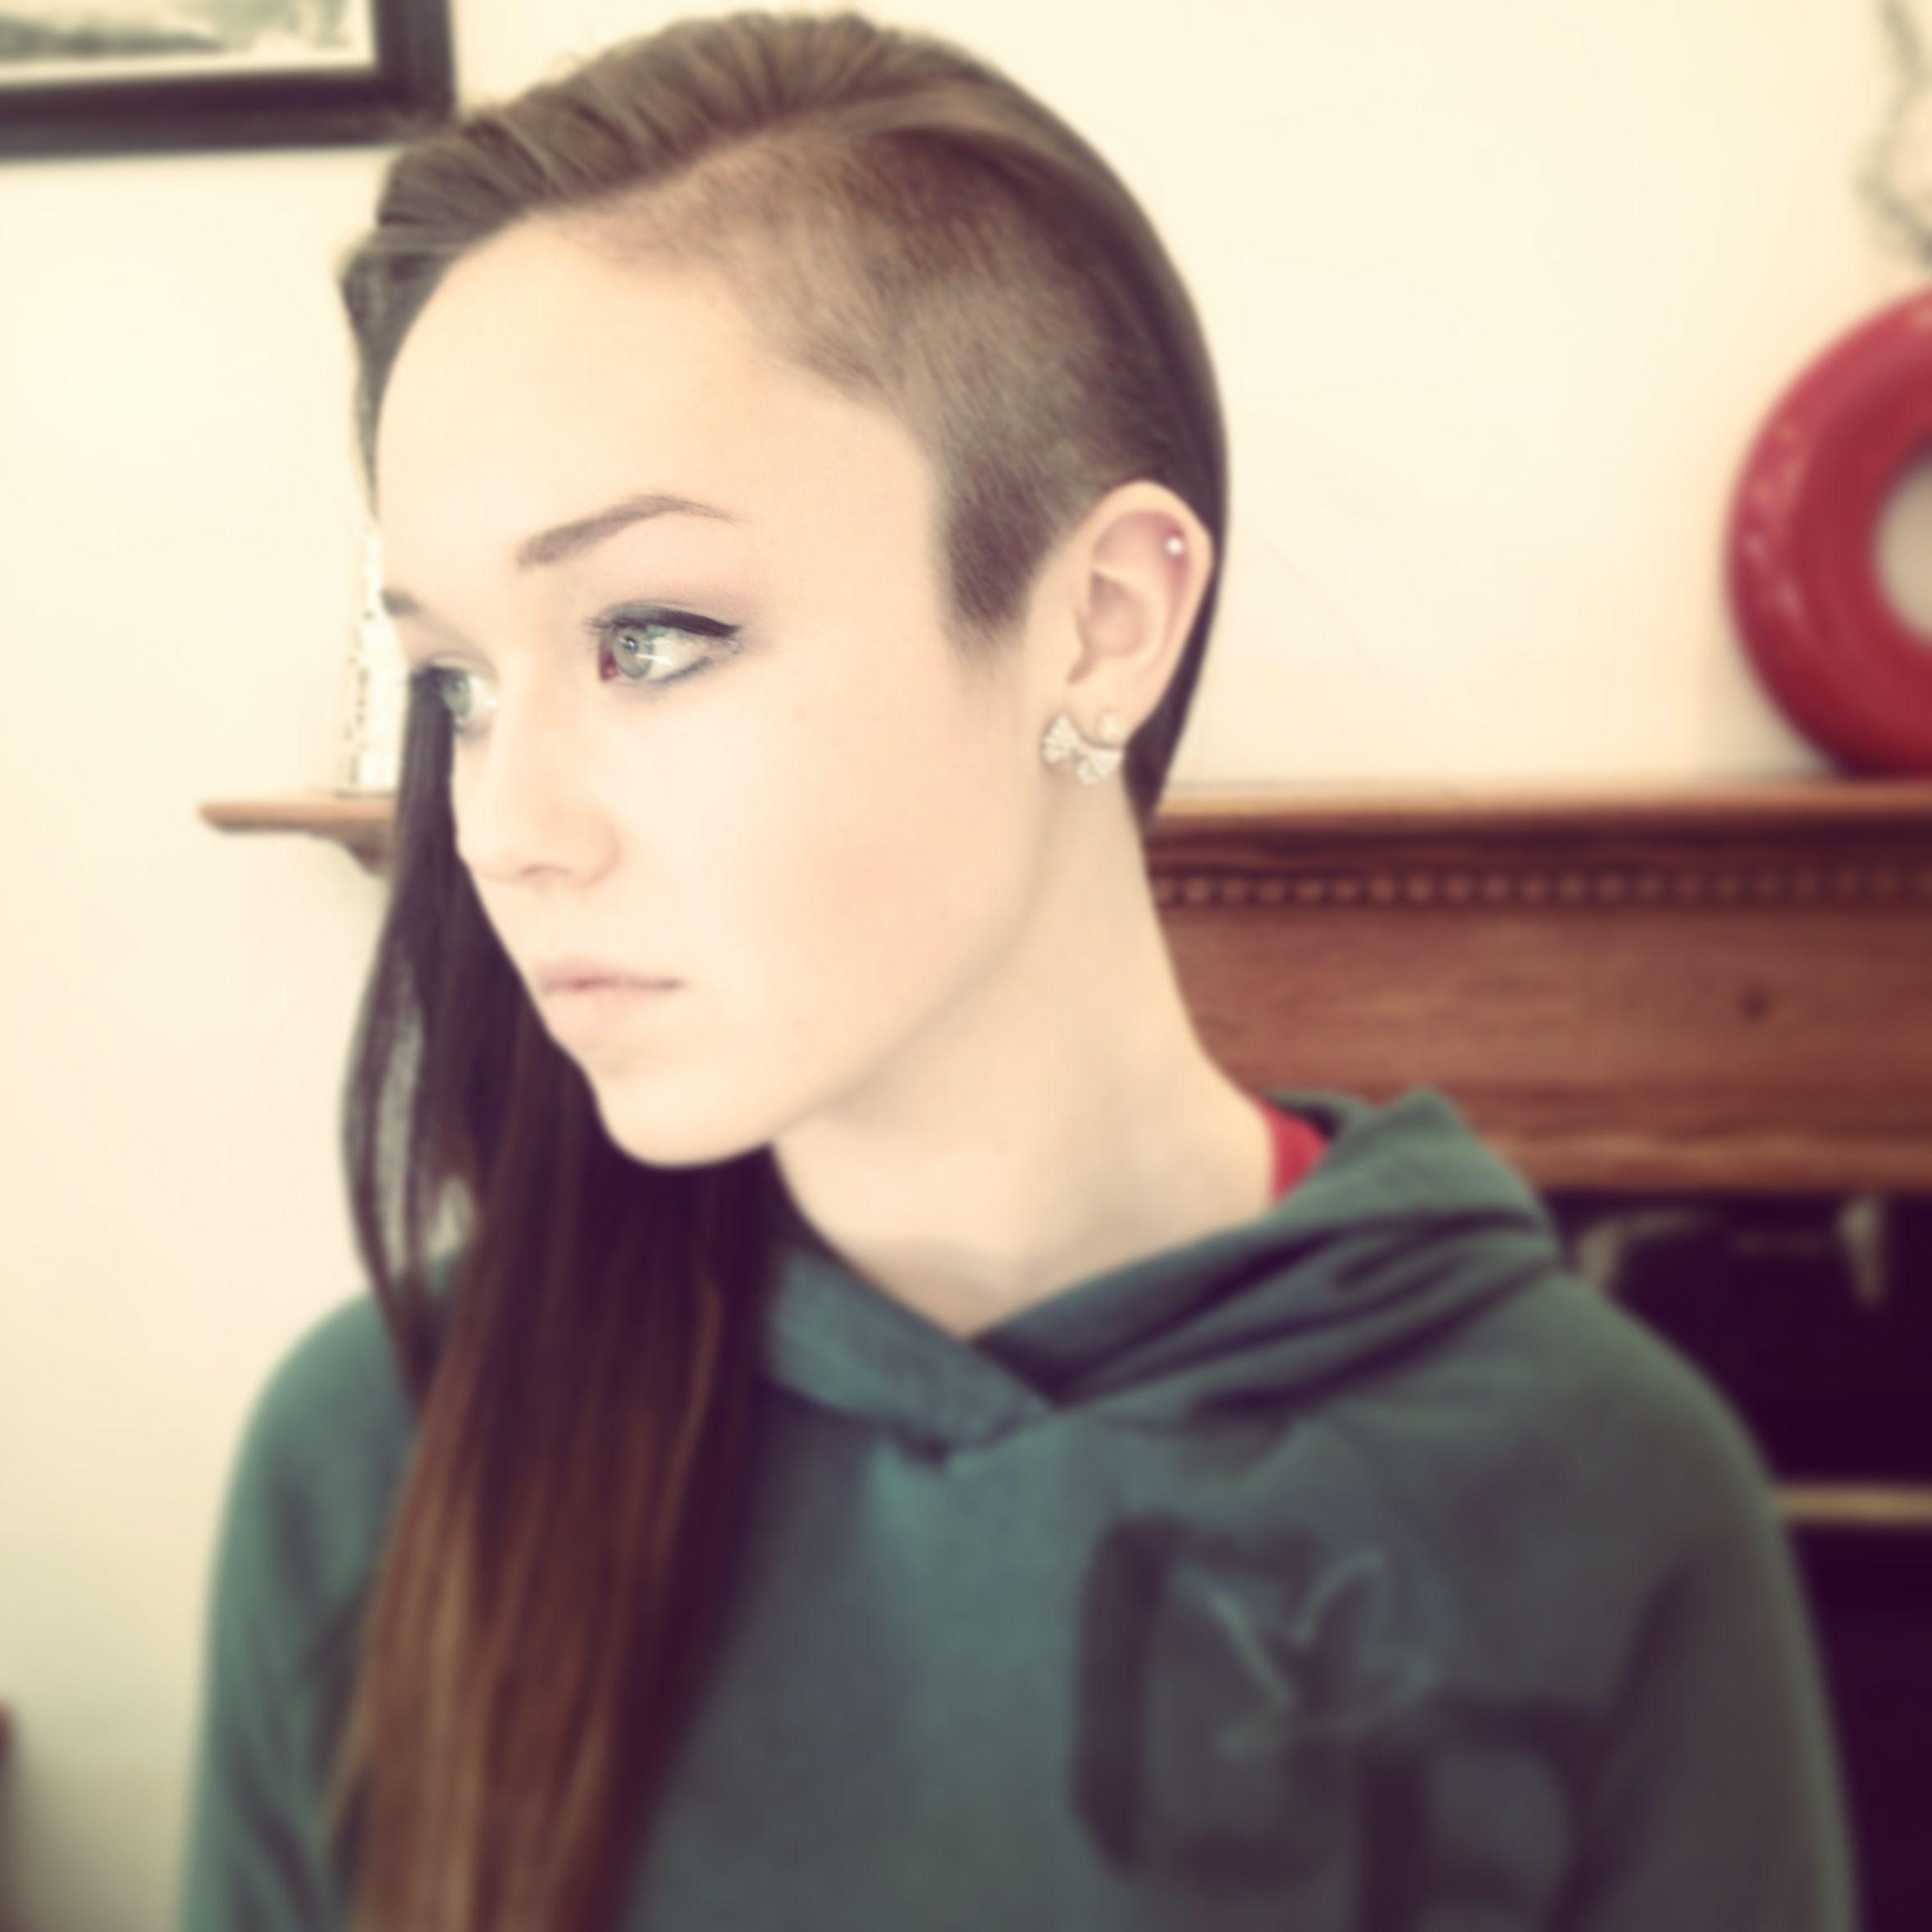 Half shaved head cute